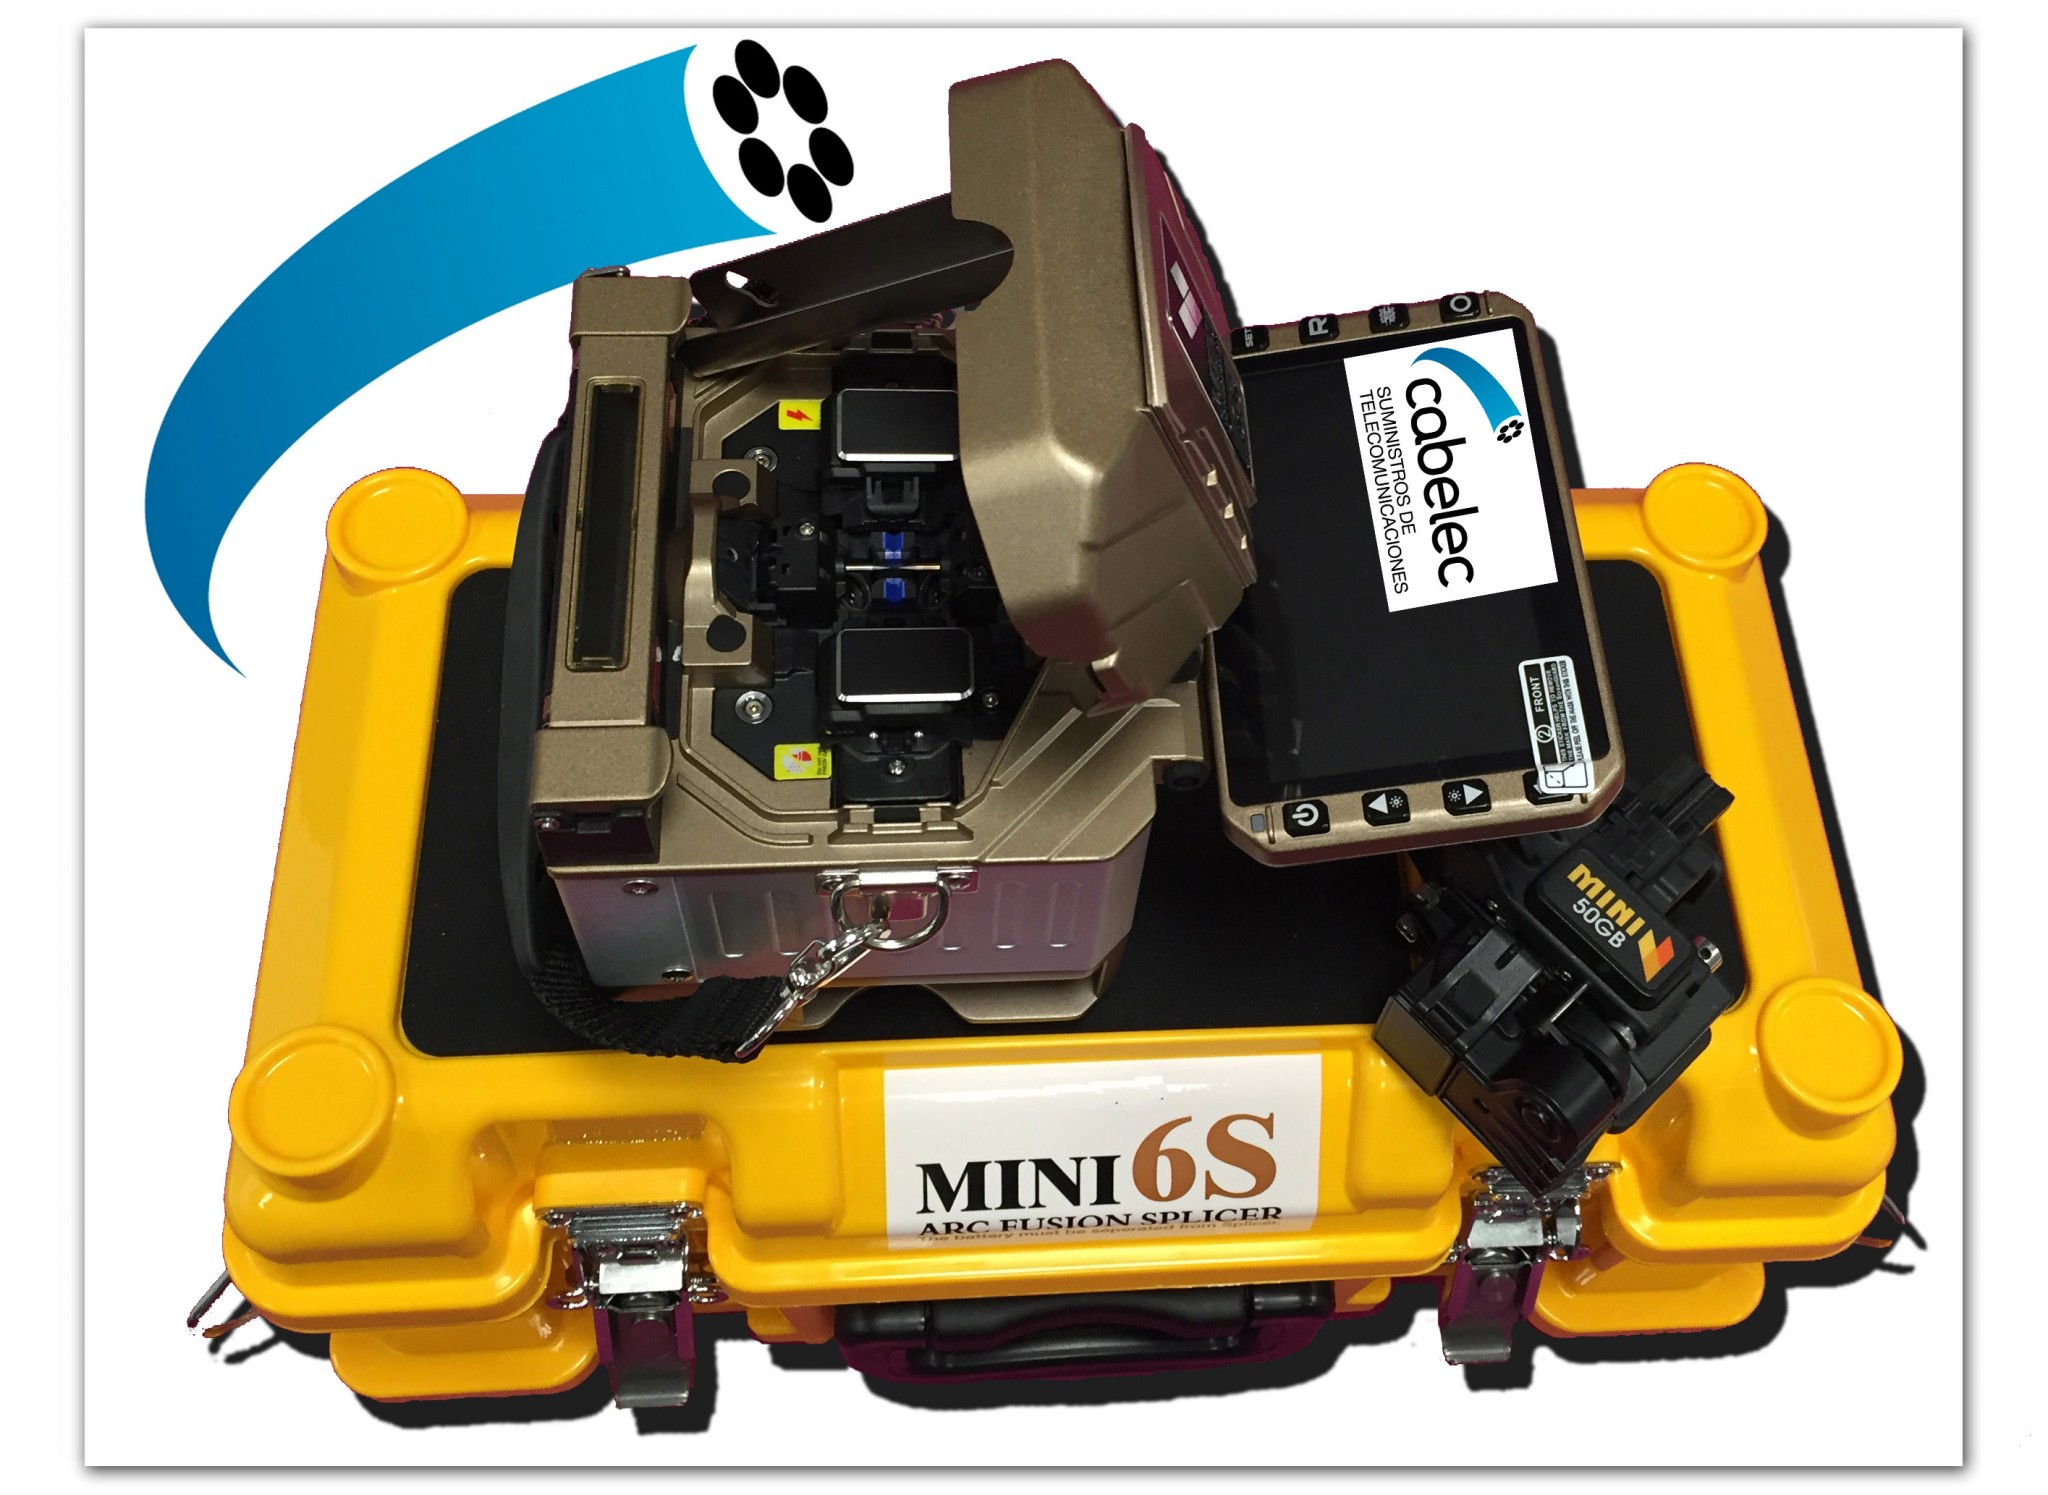 maletin de alta resitencia apra kit de fusionadora de fibra óptica